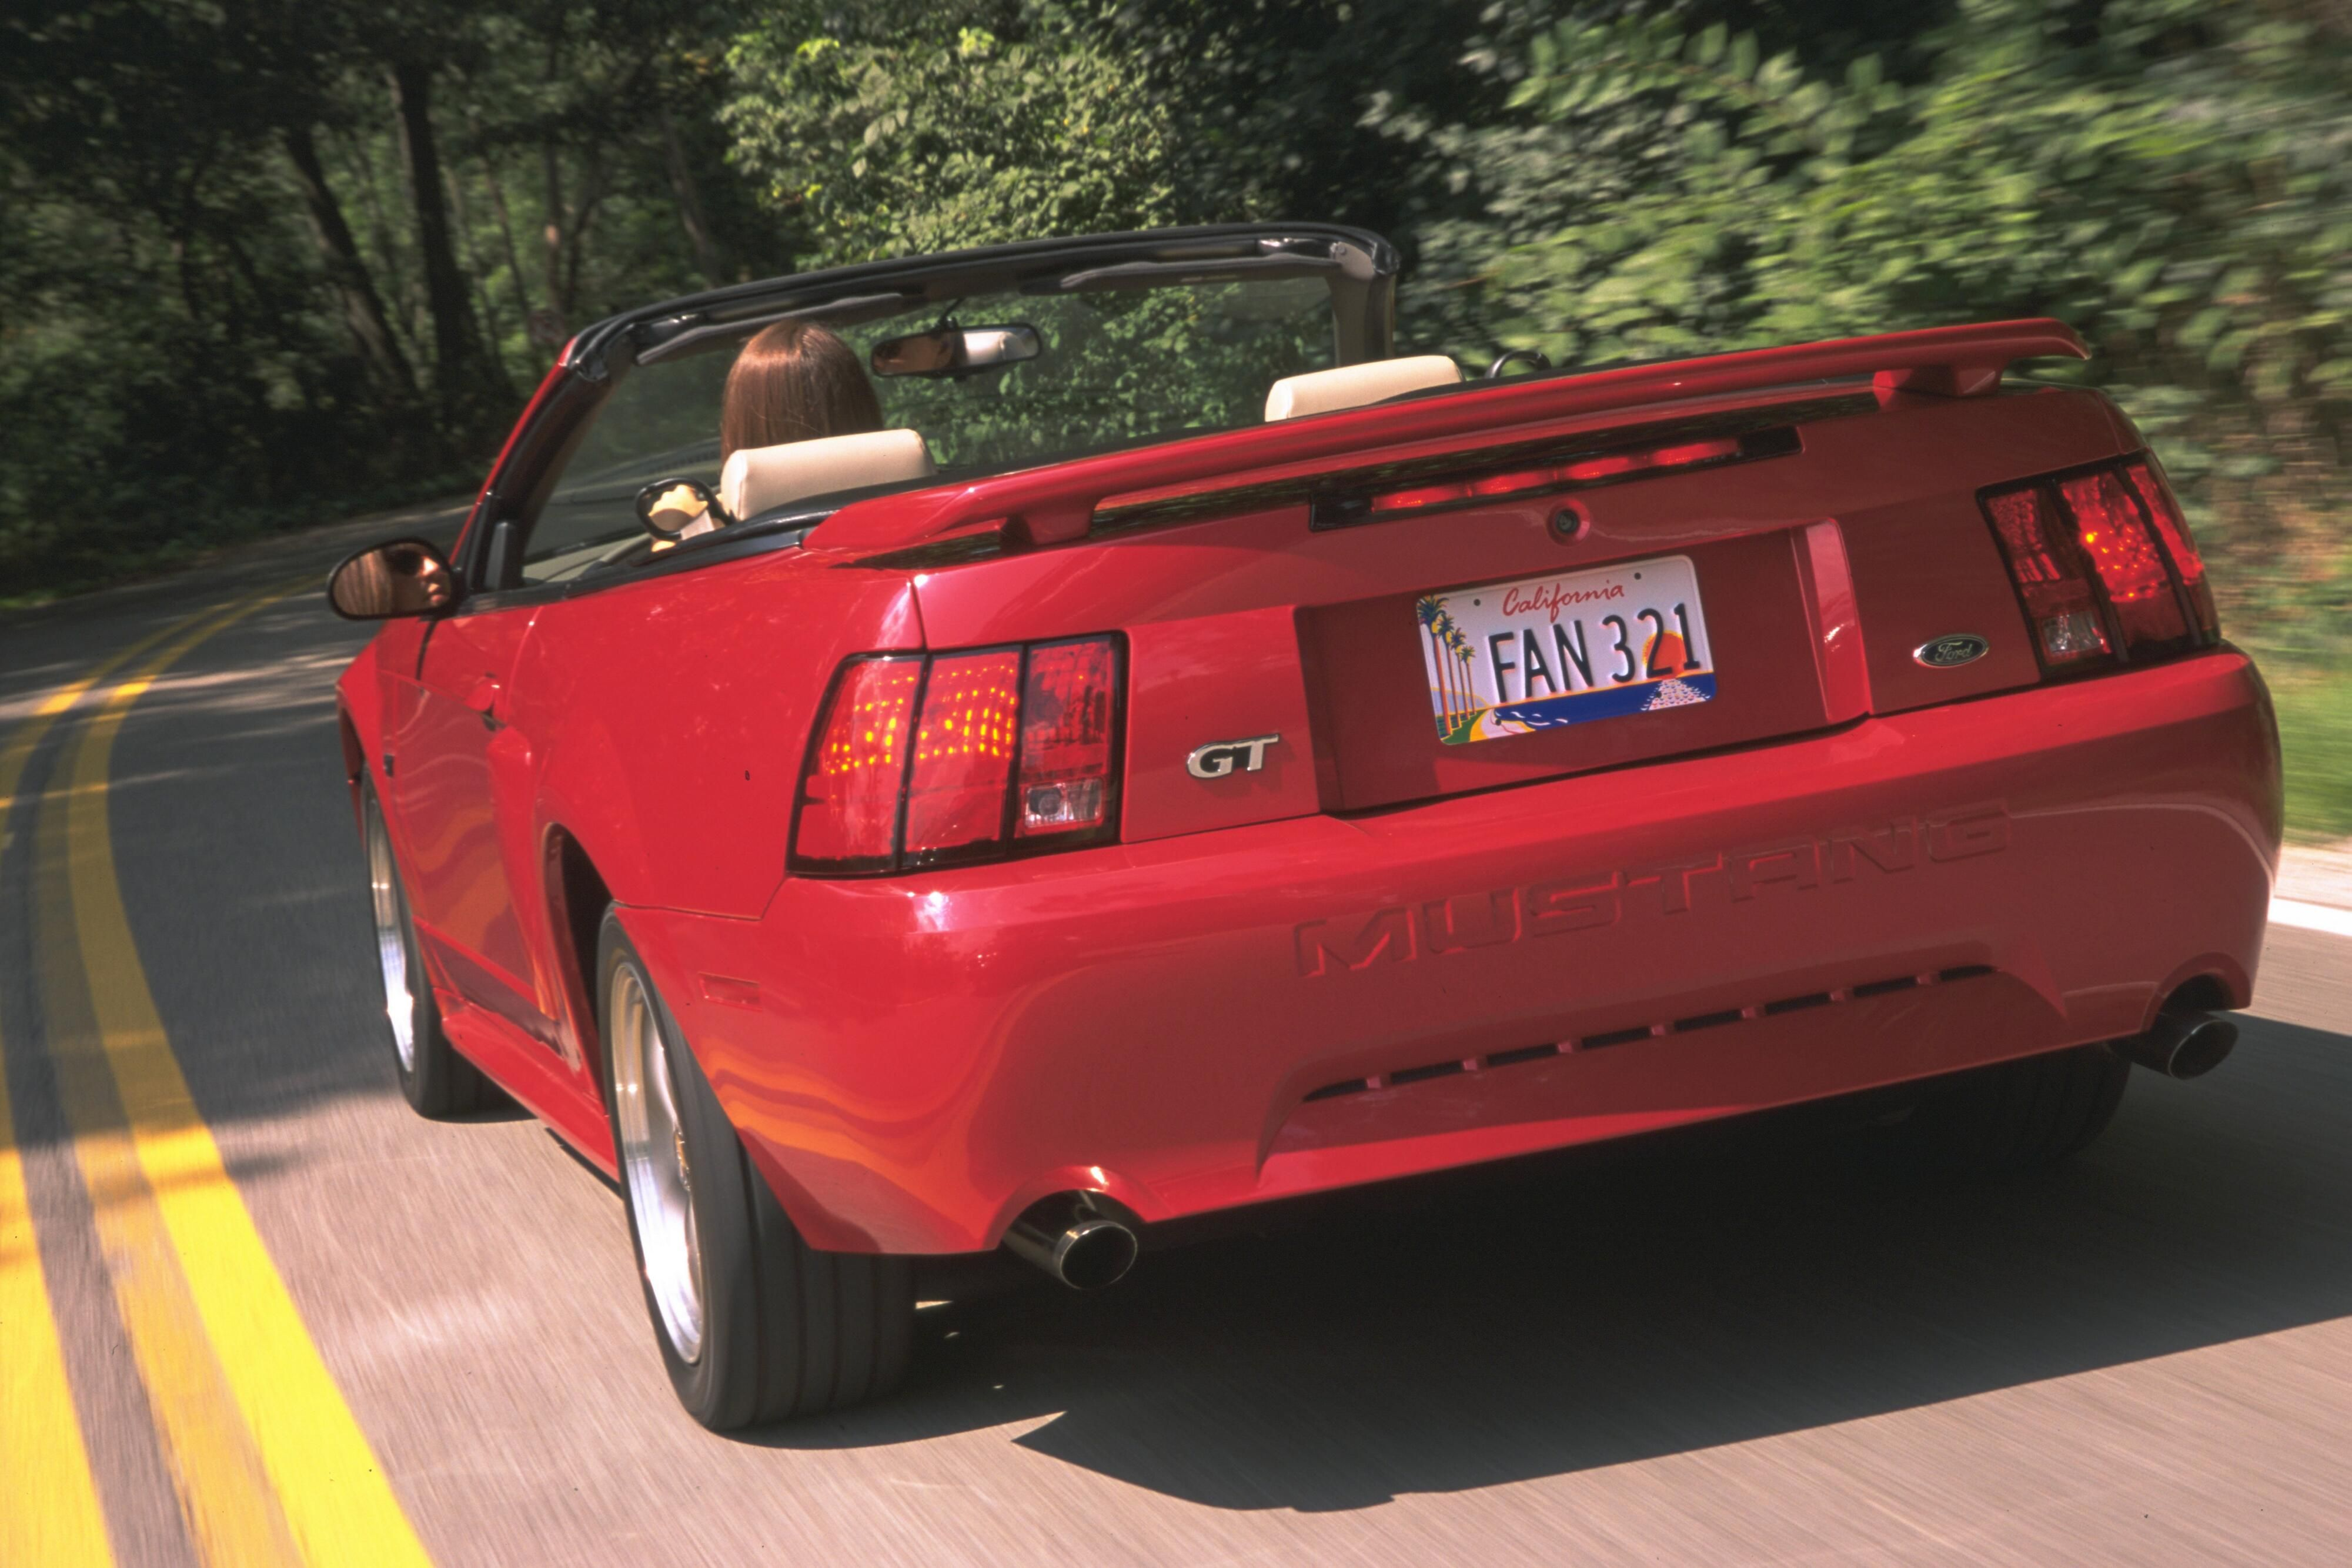 2001 Ford Mustang Gt Ford Mustang Ford Mustang Gt 2001 Ford Mustang